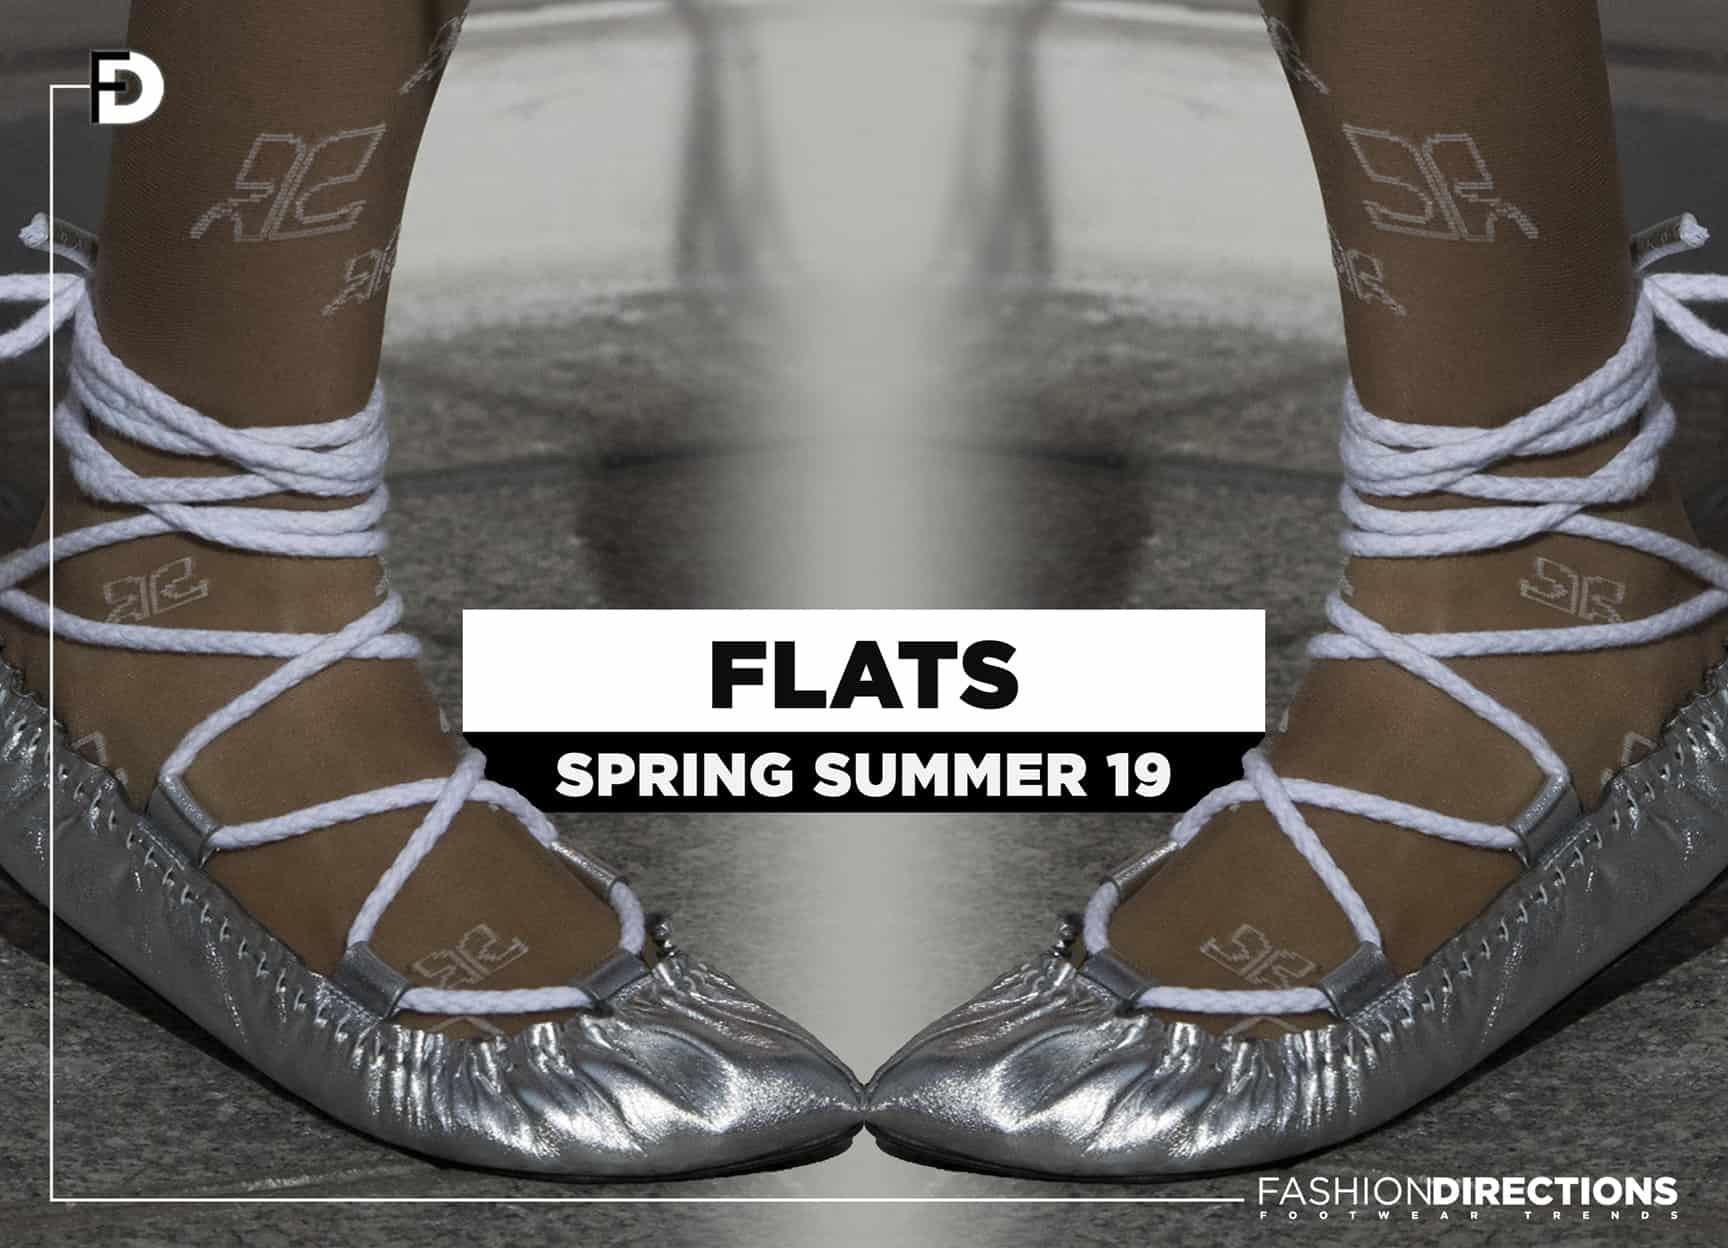 ss19 Flats spring summer 2019